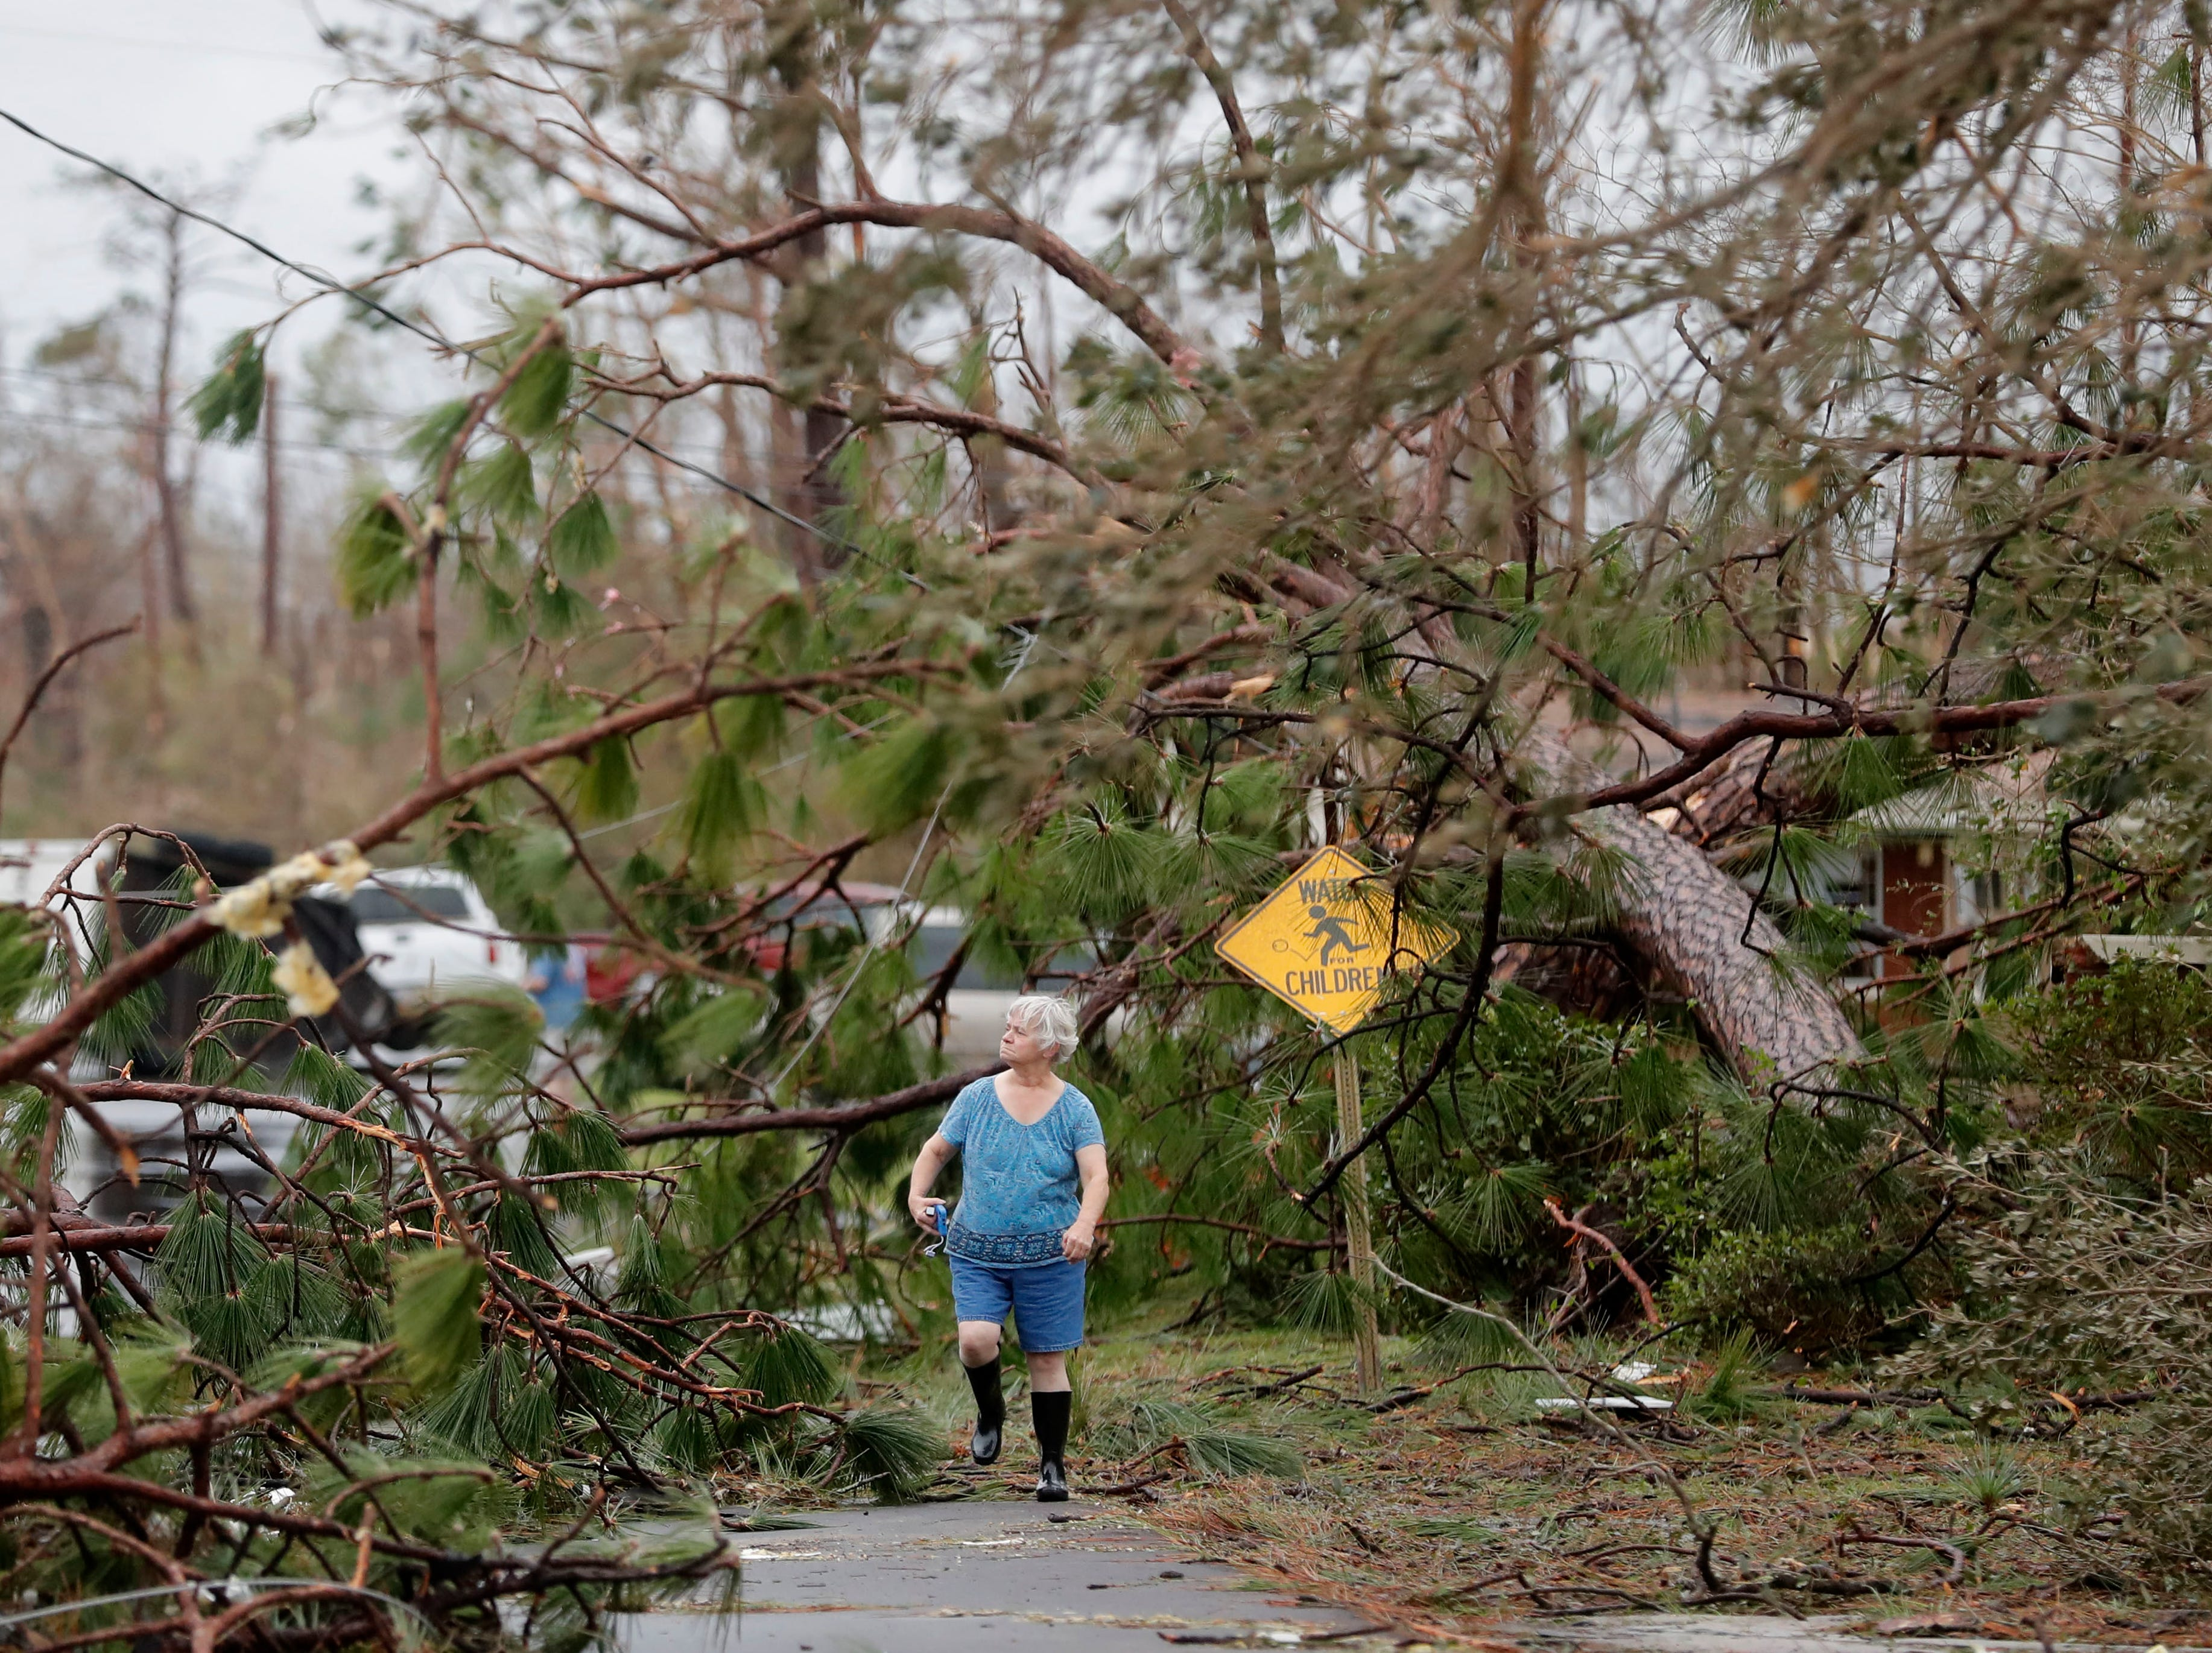 Carol Ralph walks through downed trees blocking her heavily damaged neighborhood just after Hurricane Michael passed through in Panama City, Fla., Wednesday, Oct. 10, 2018.